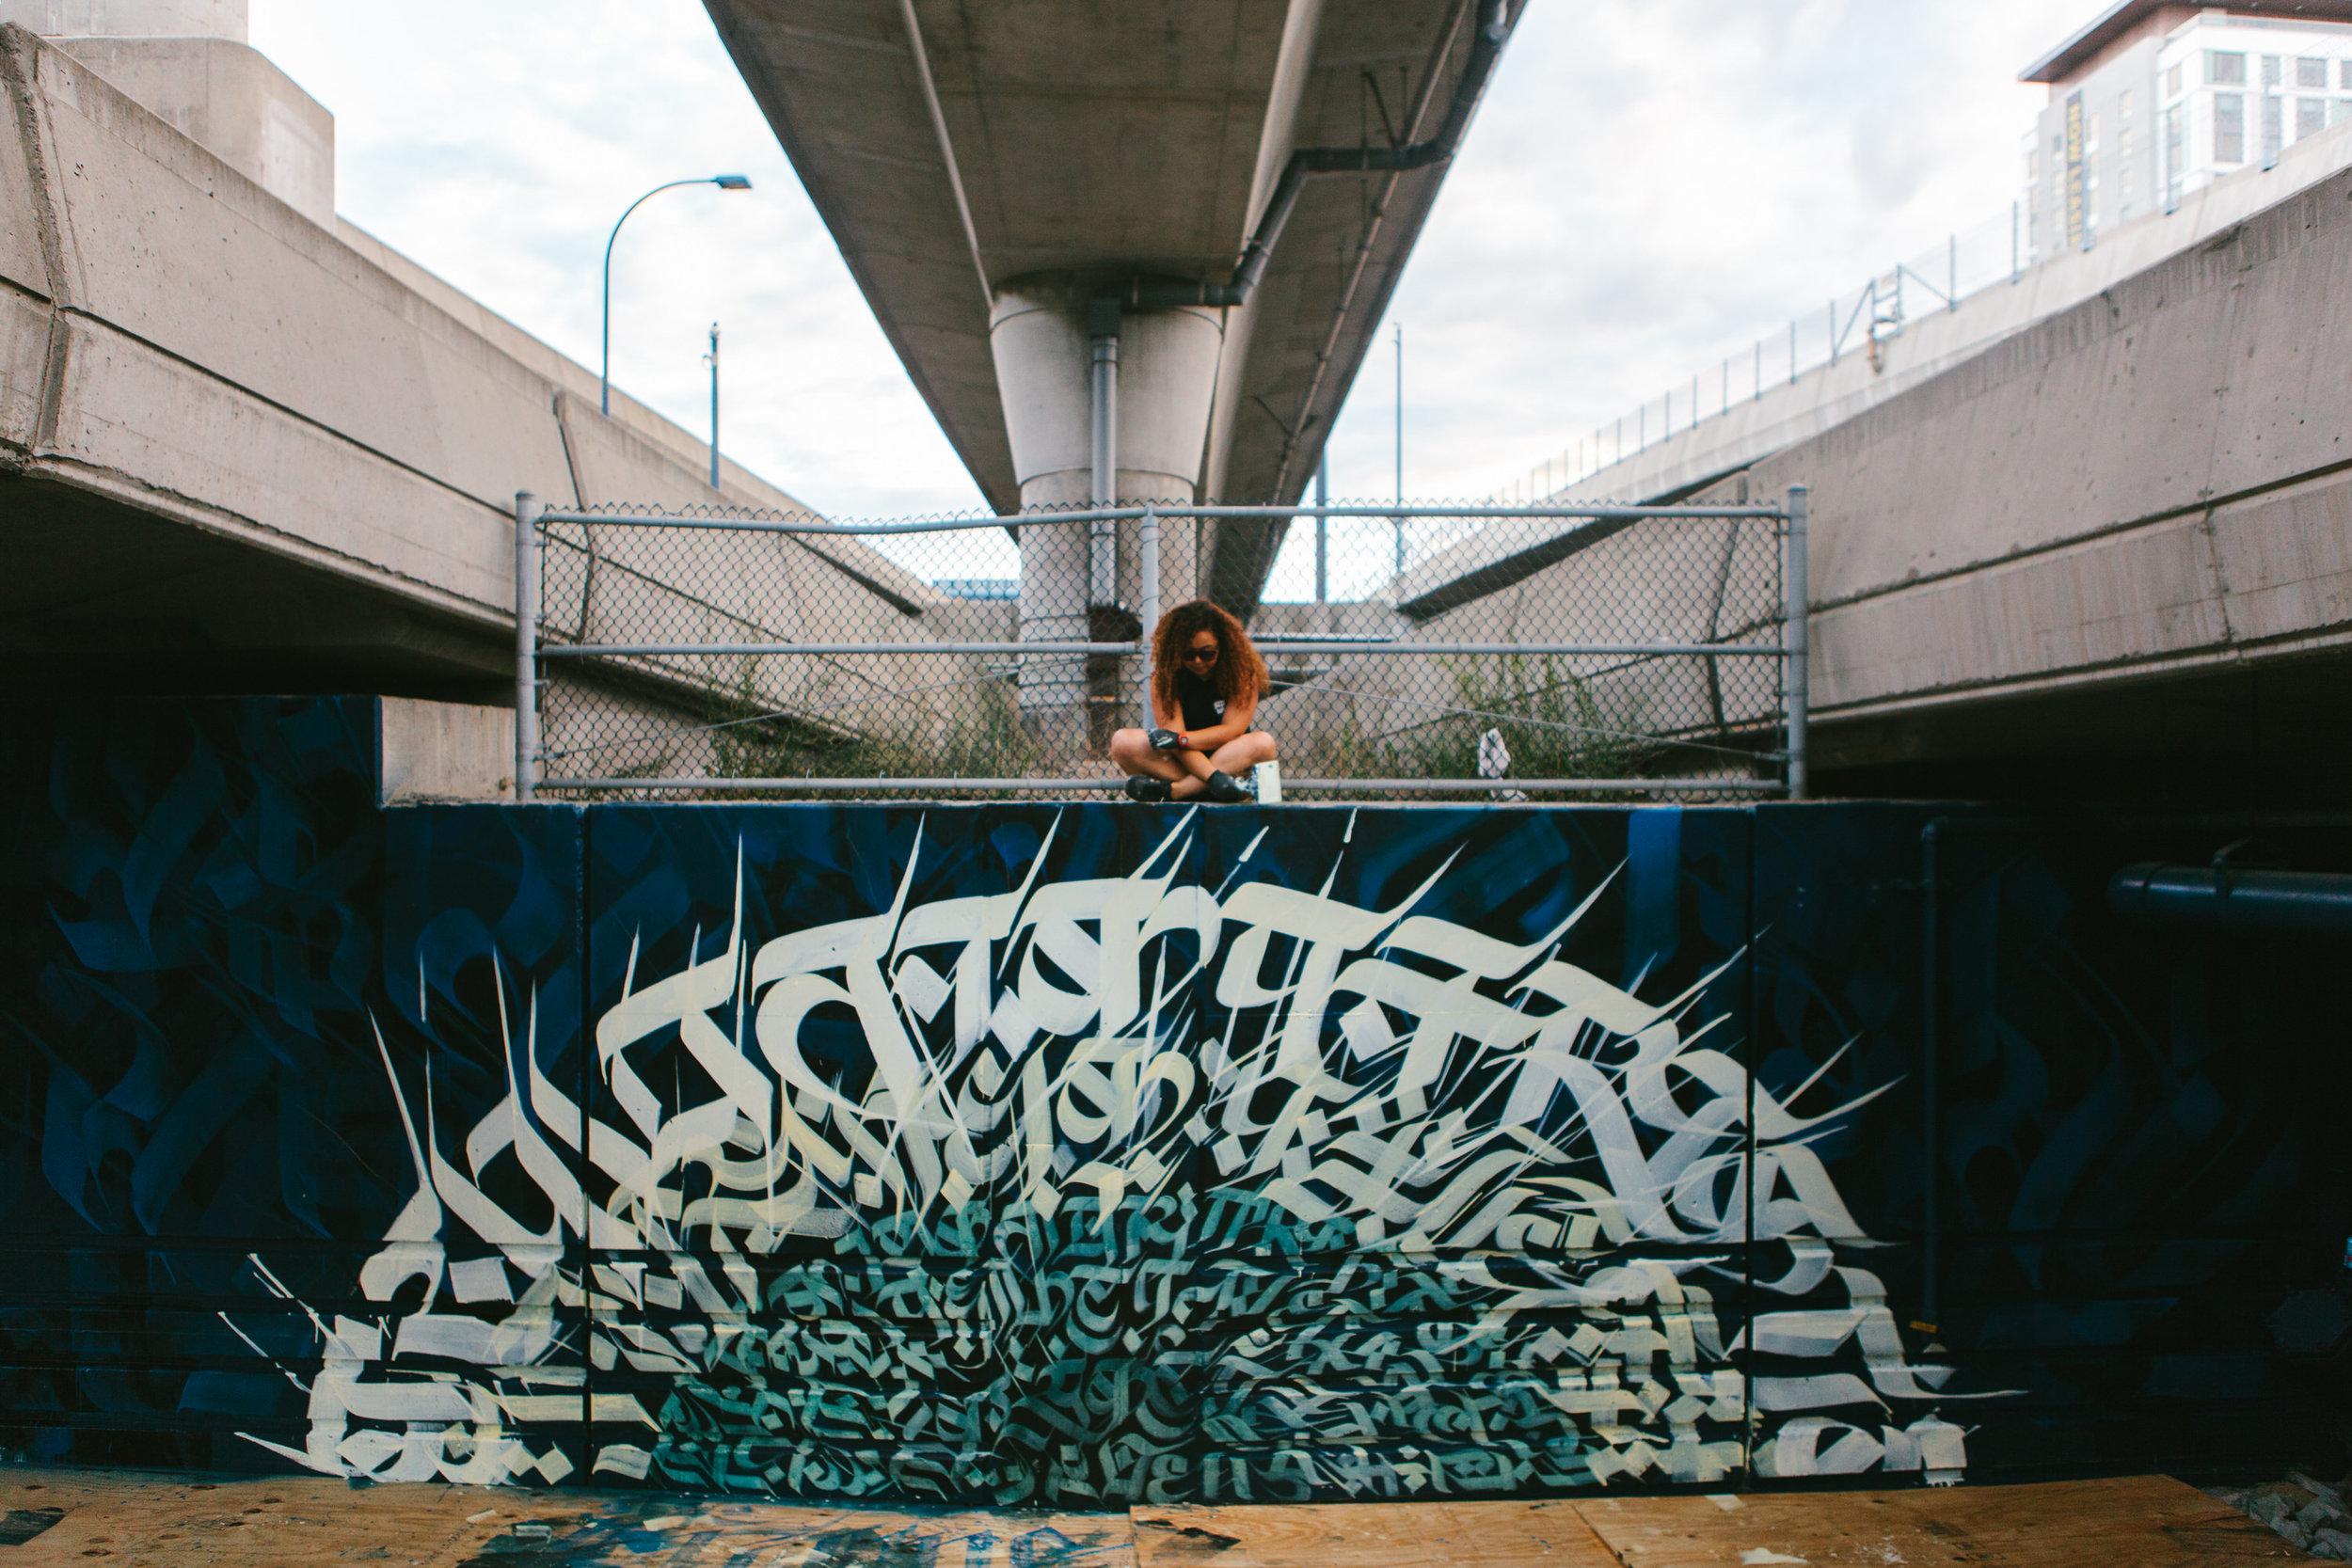 Underground Mural Project, Boston, 2017